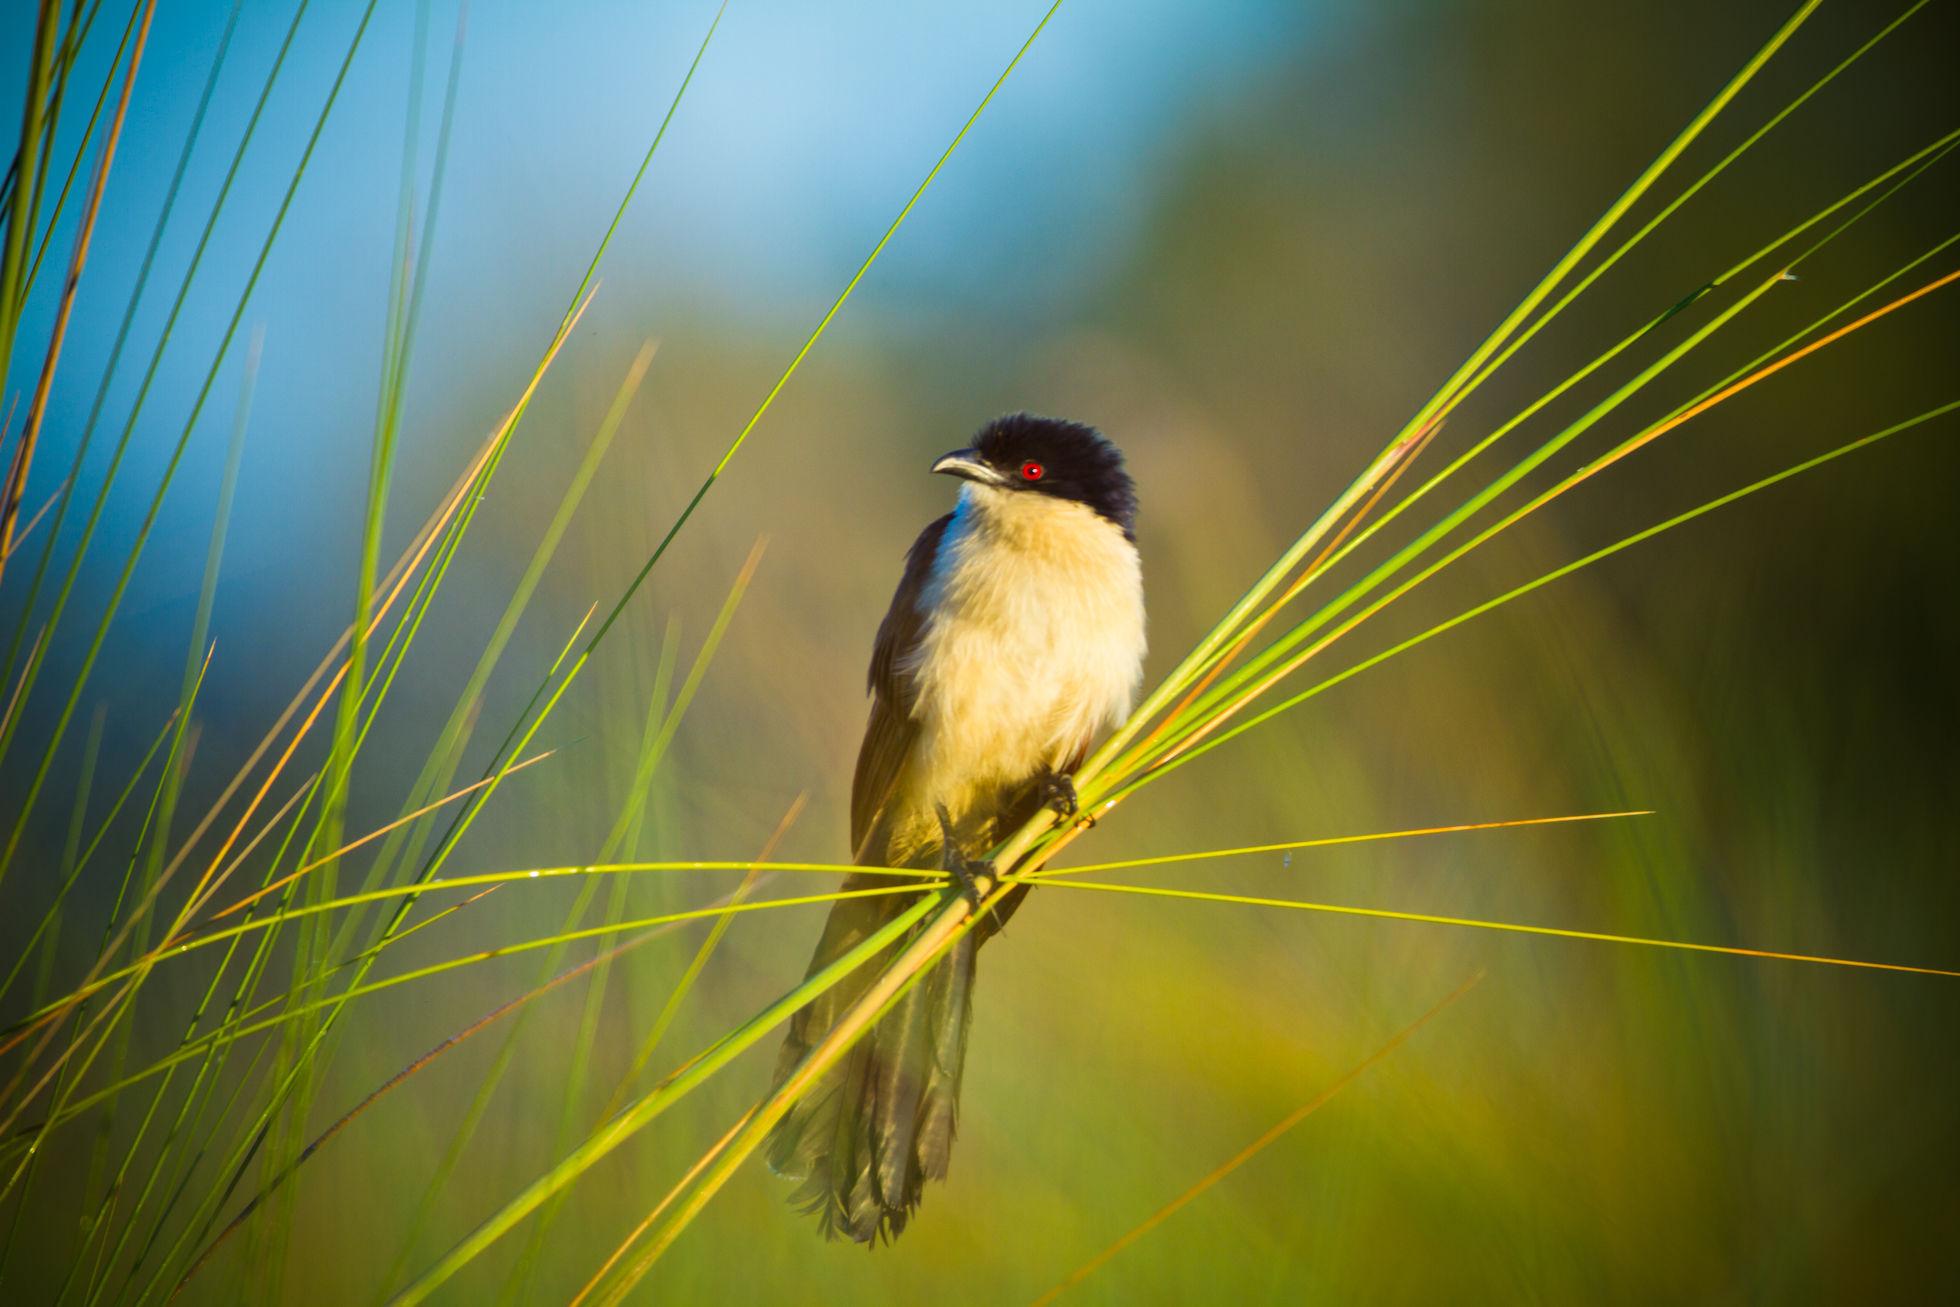 belmond-eagle-island-activities-bird-watching-02